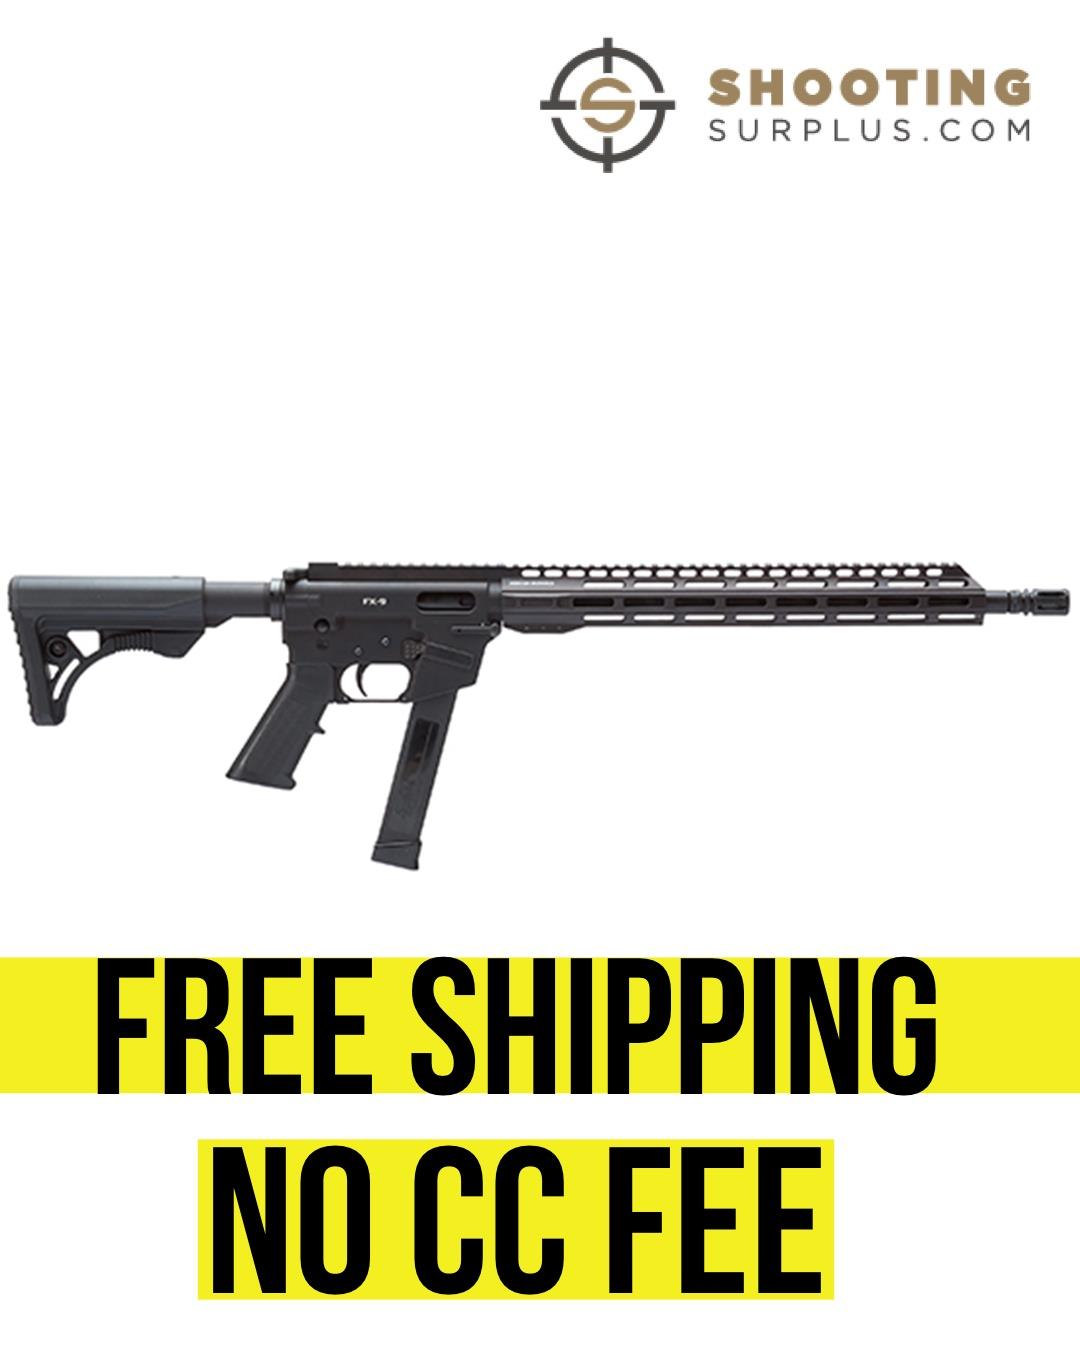 Classic Firearms Fx-9 Carbine 9MM 33Rd FX9 - Semi Auto Rifles at